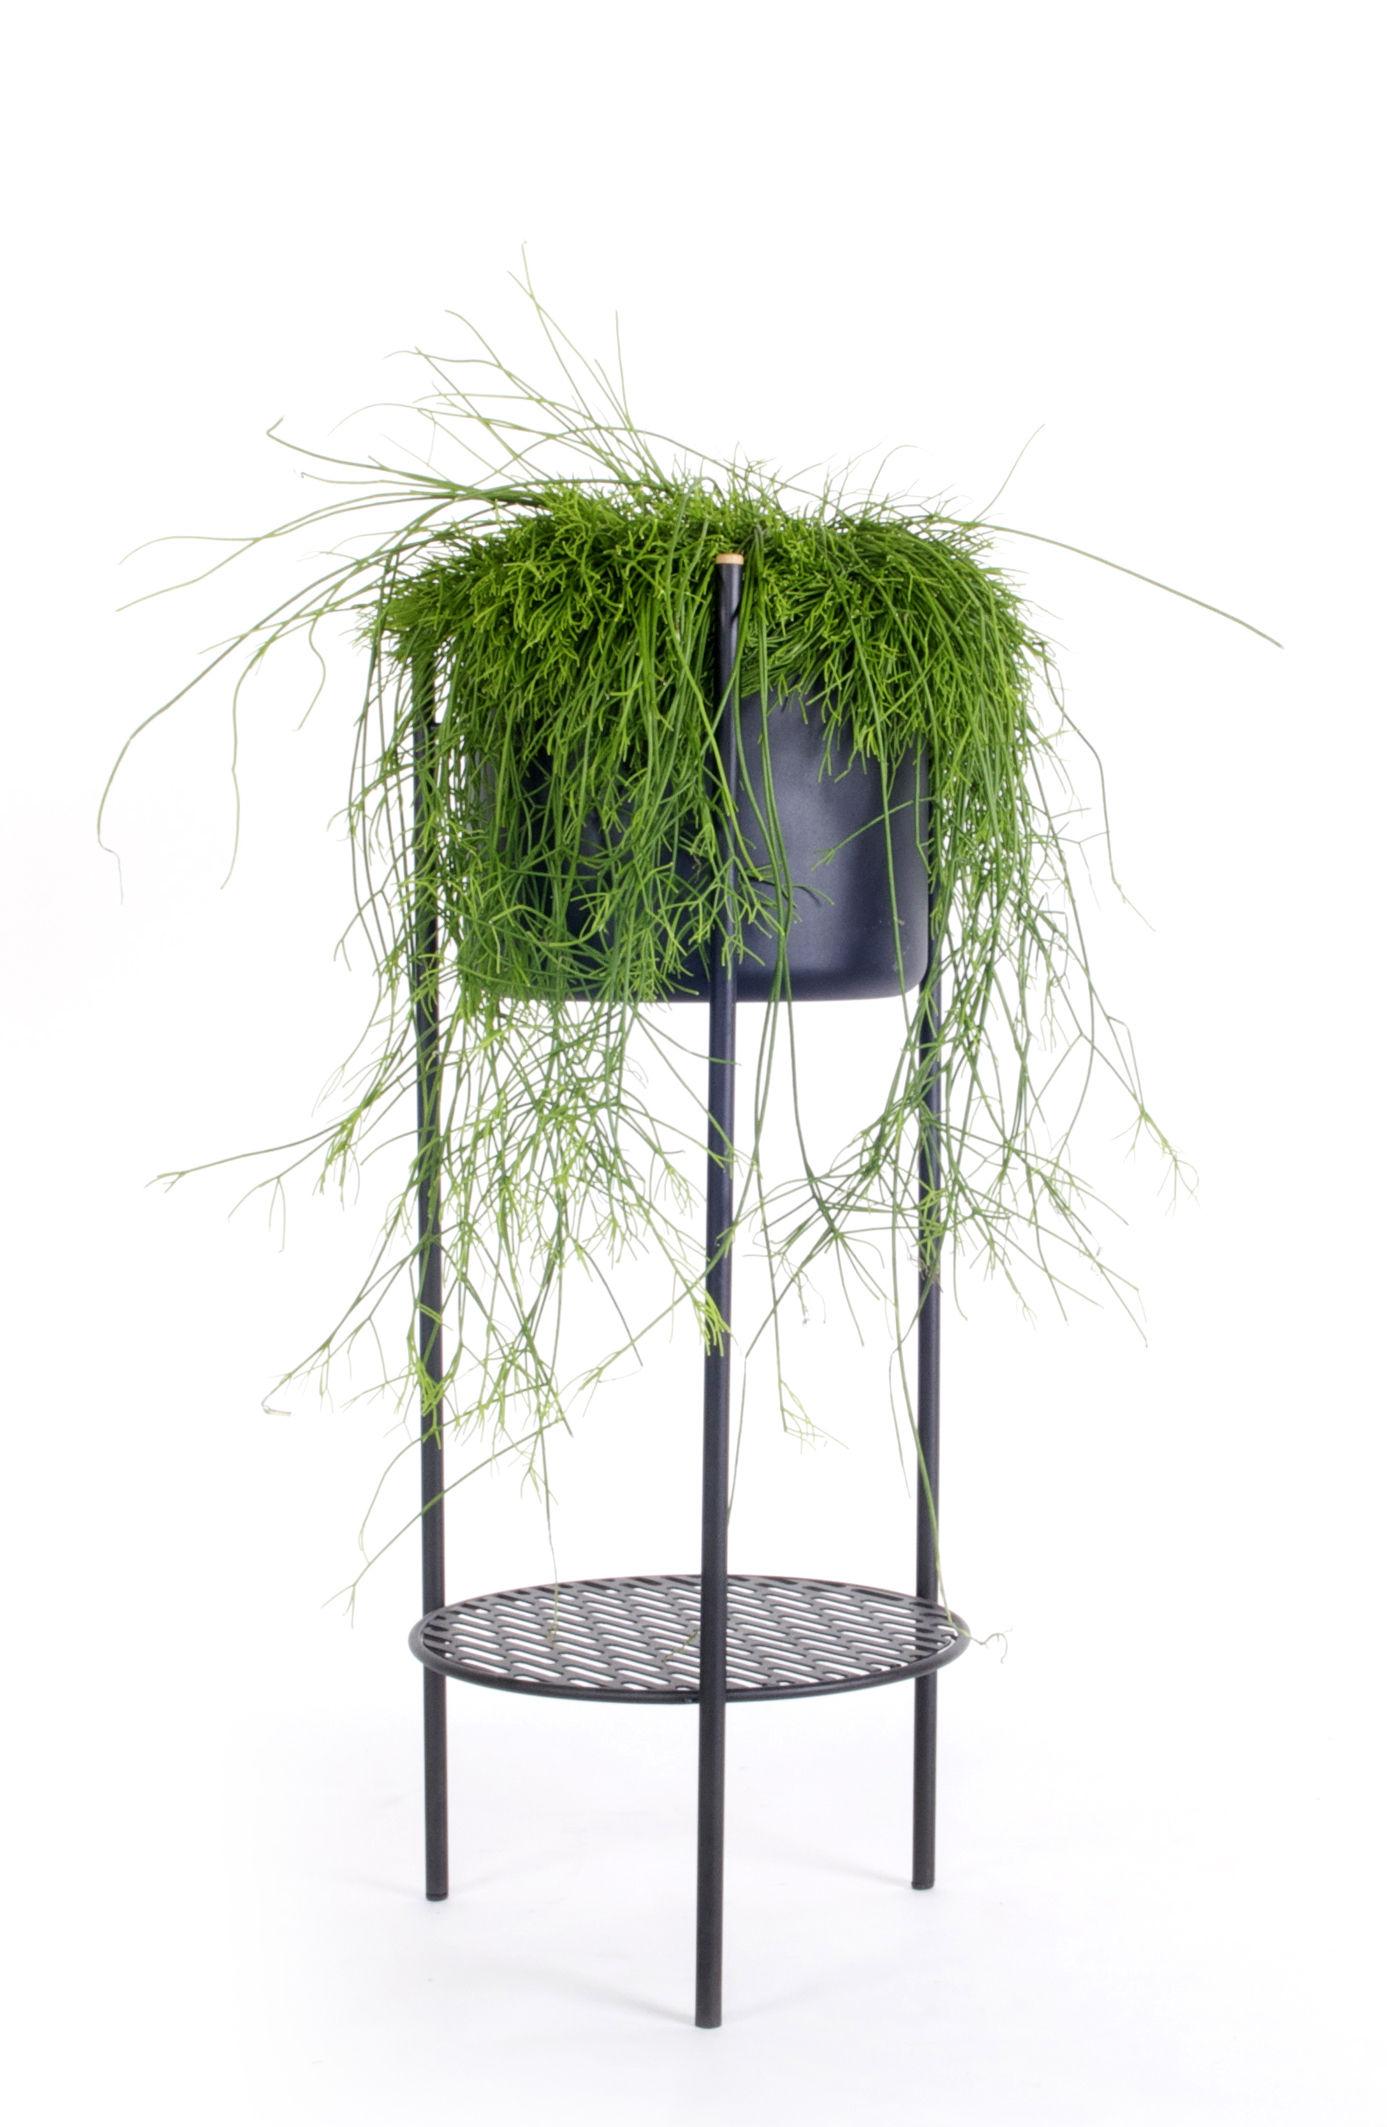 Outdoor - Pots et plantes - Pot de fleurs Ent Medium / H 78 cm - Métal - XL Boom - Noir - Acier laqué époxy